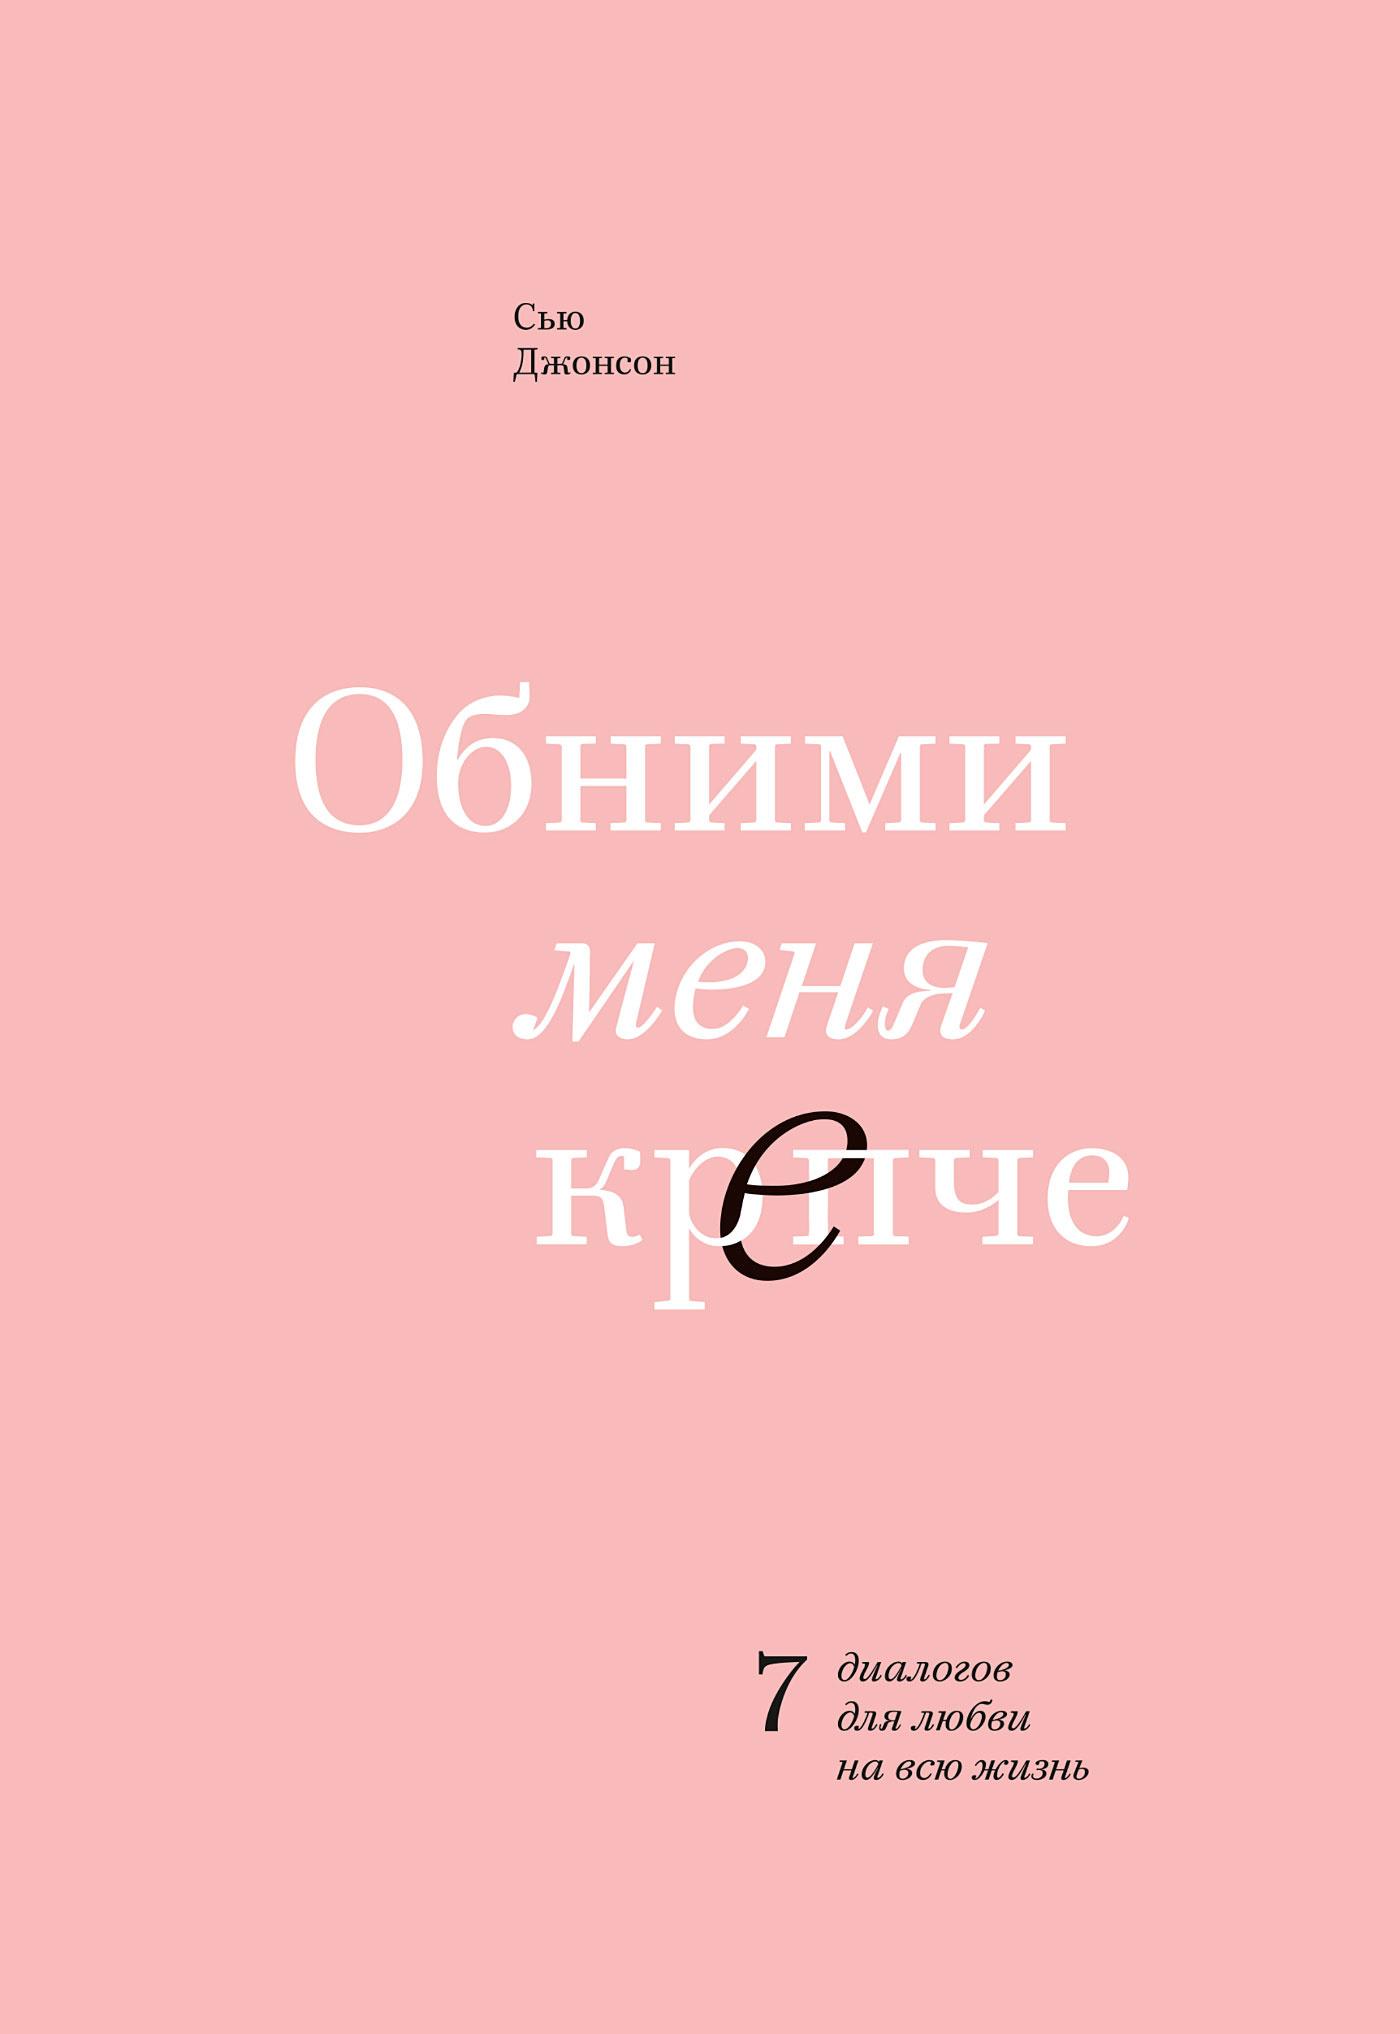 Обними меня крепче. 7 диалогов для любви на всю жизнь